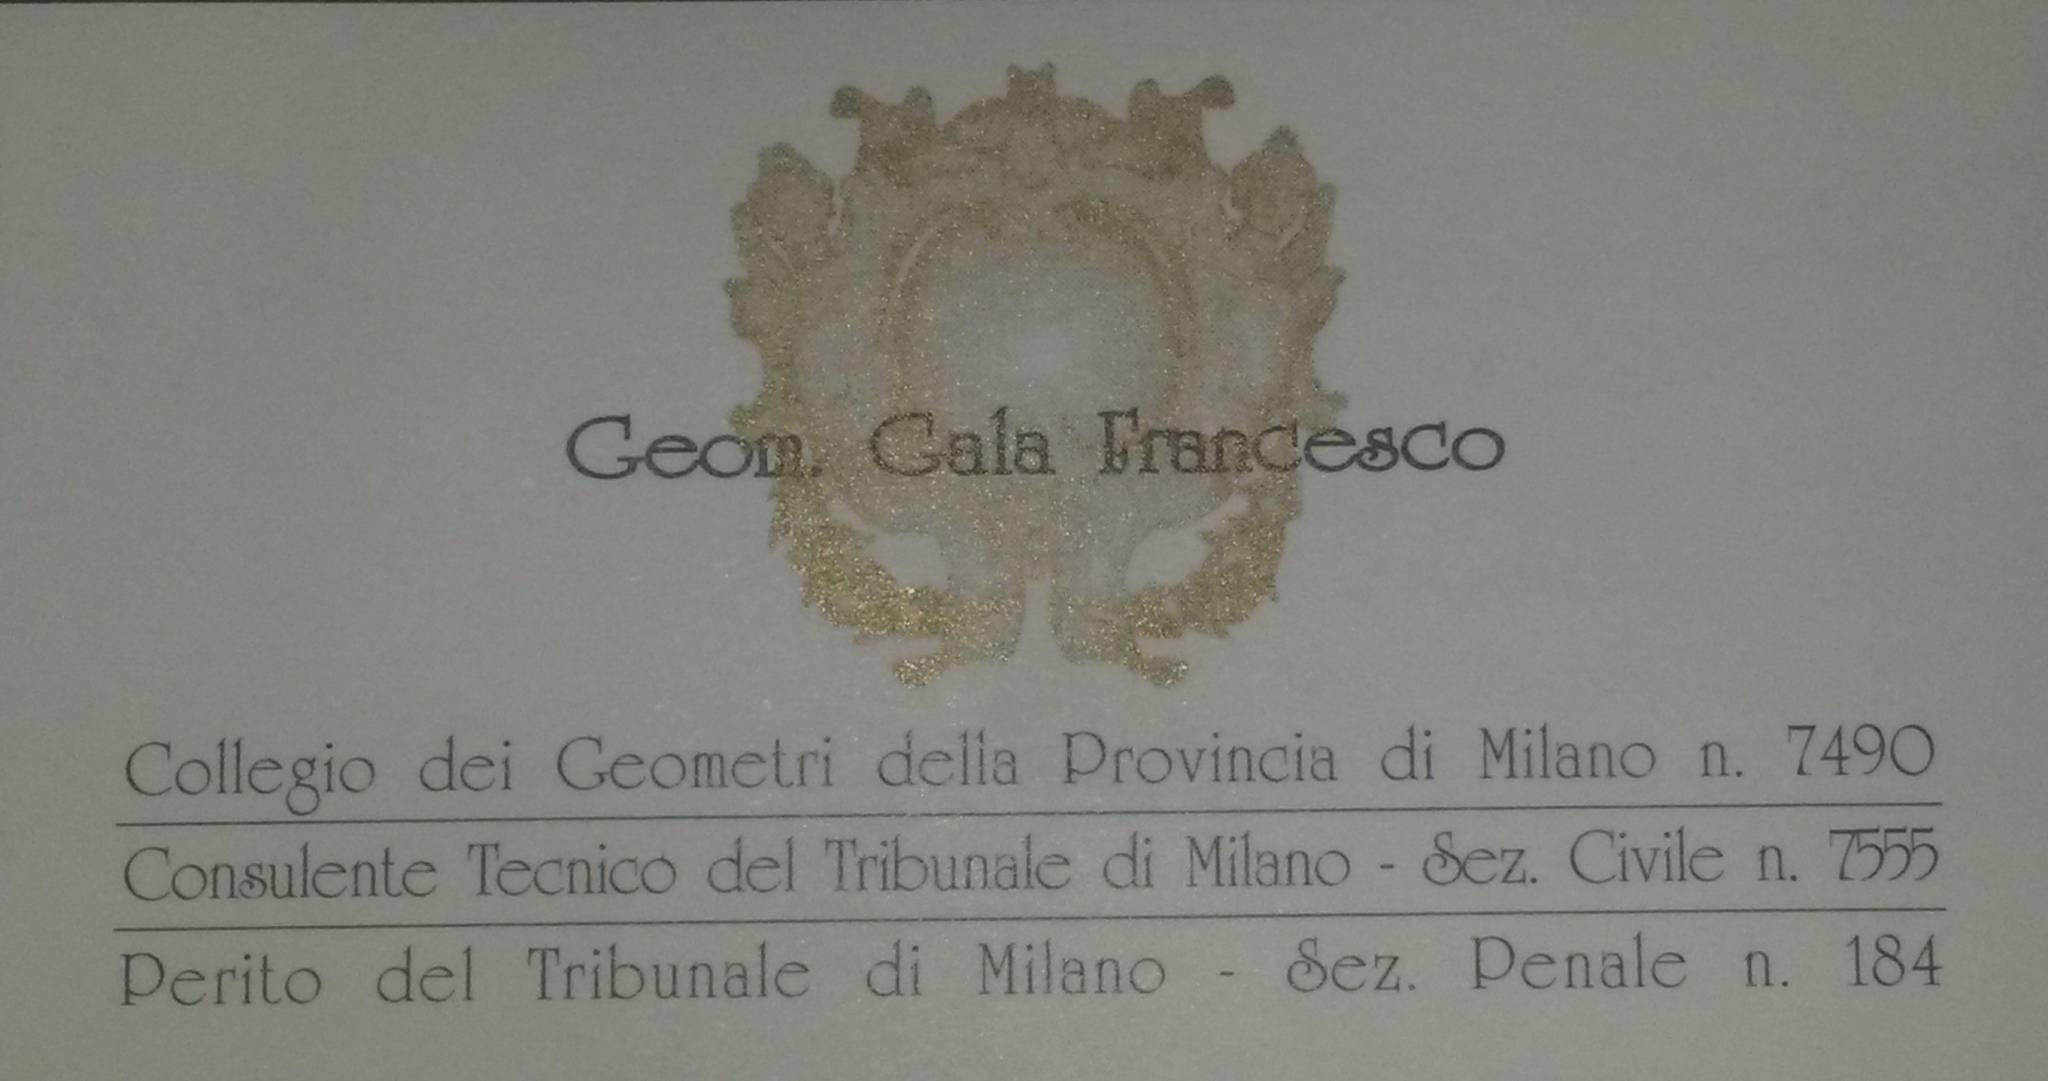 Geometra gala francesco